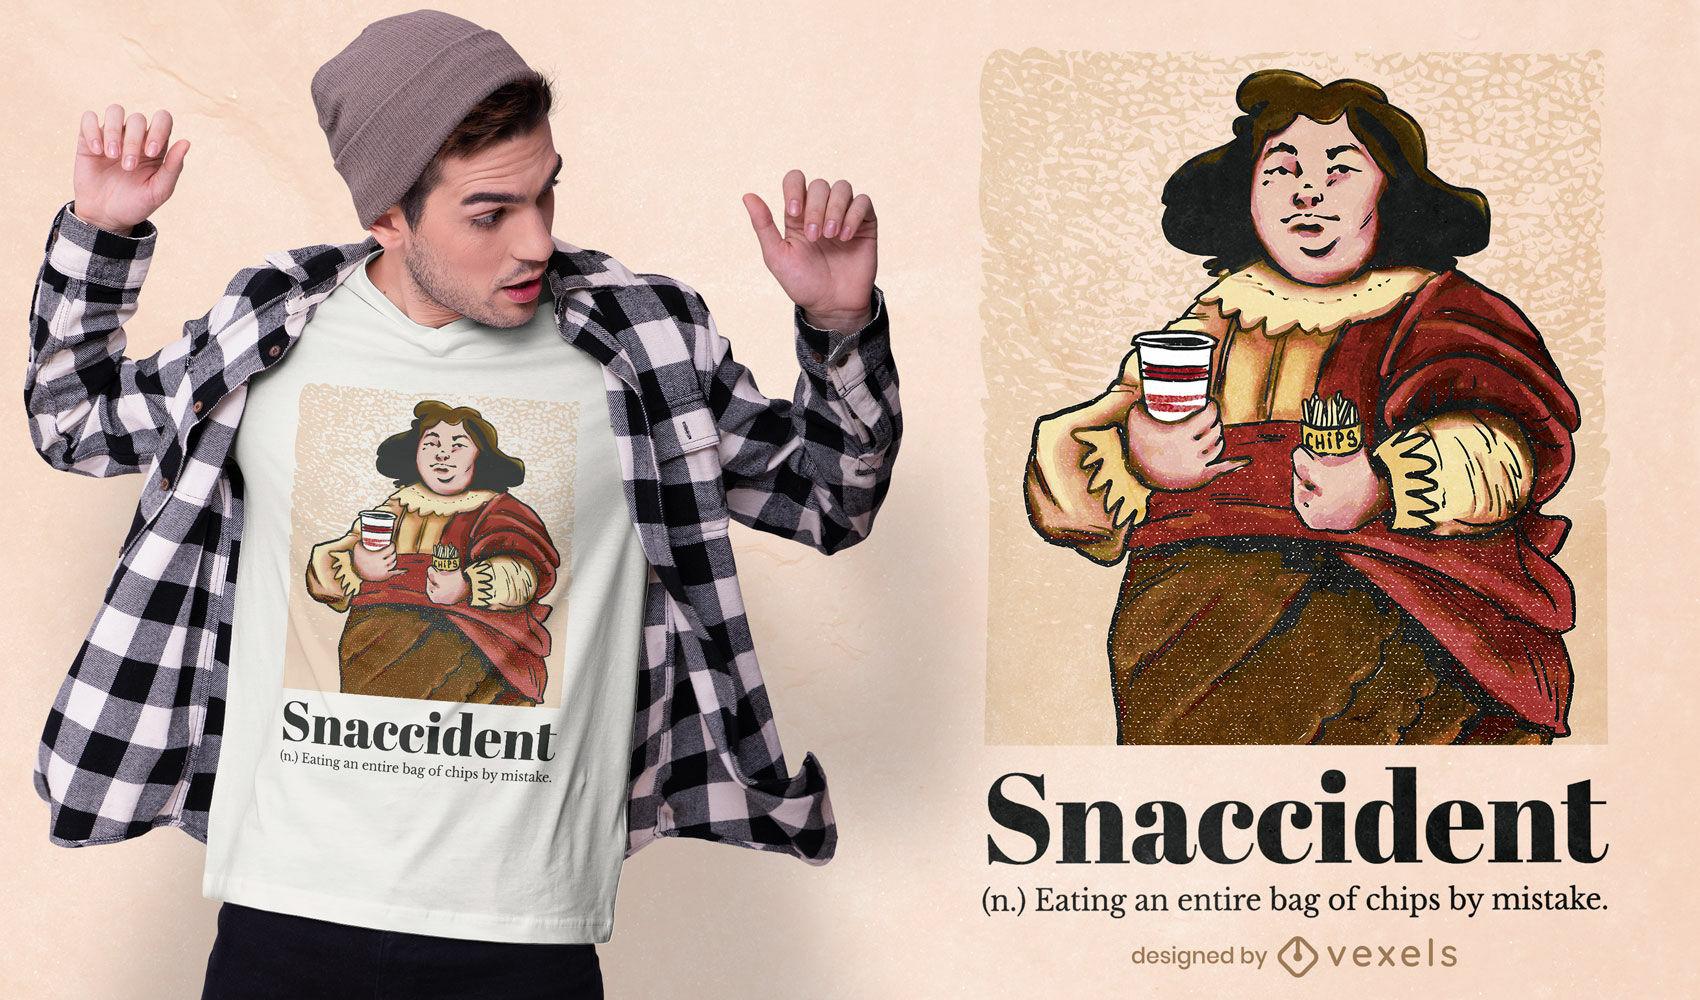 Snaccident sustantivo pintura psd diseño de camiseta